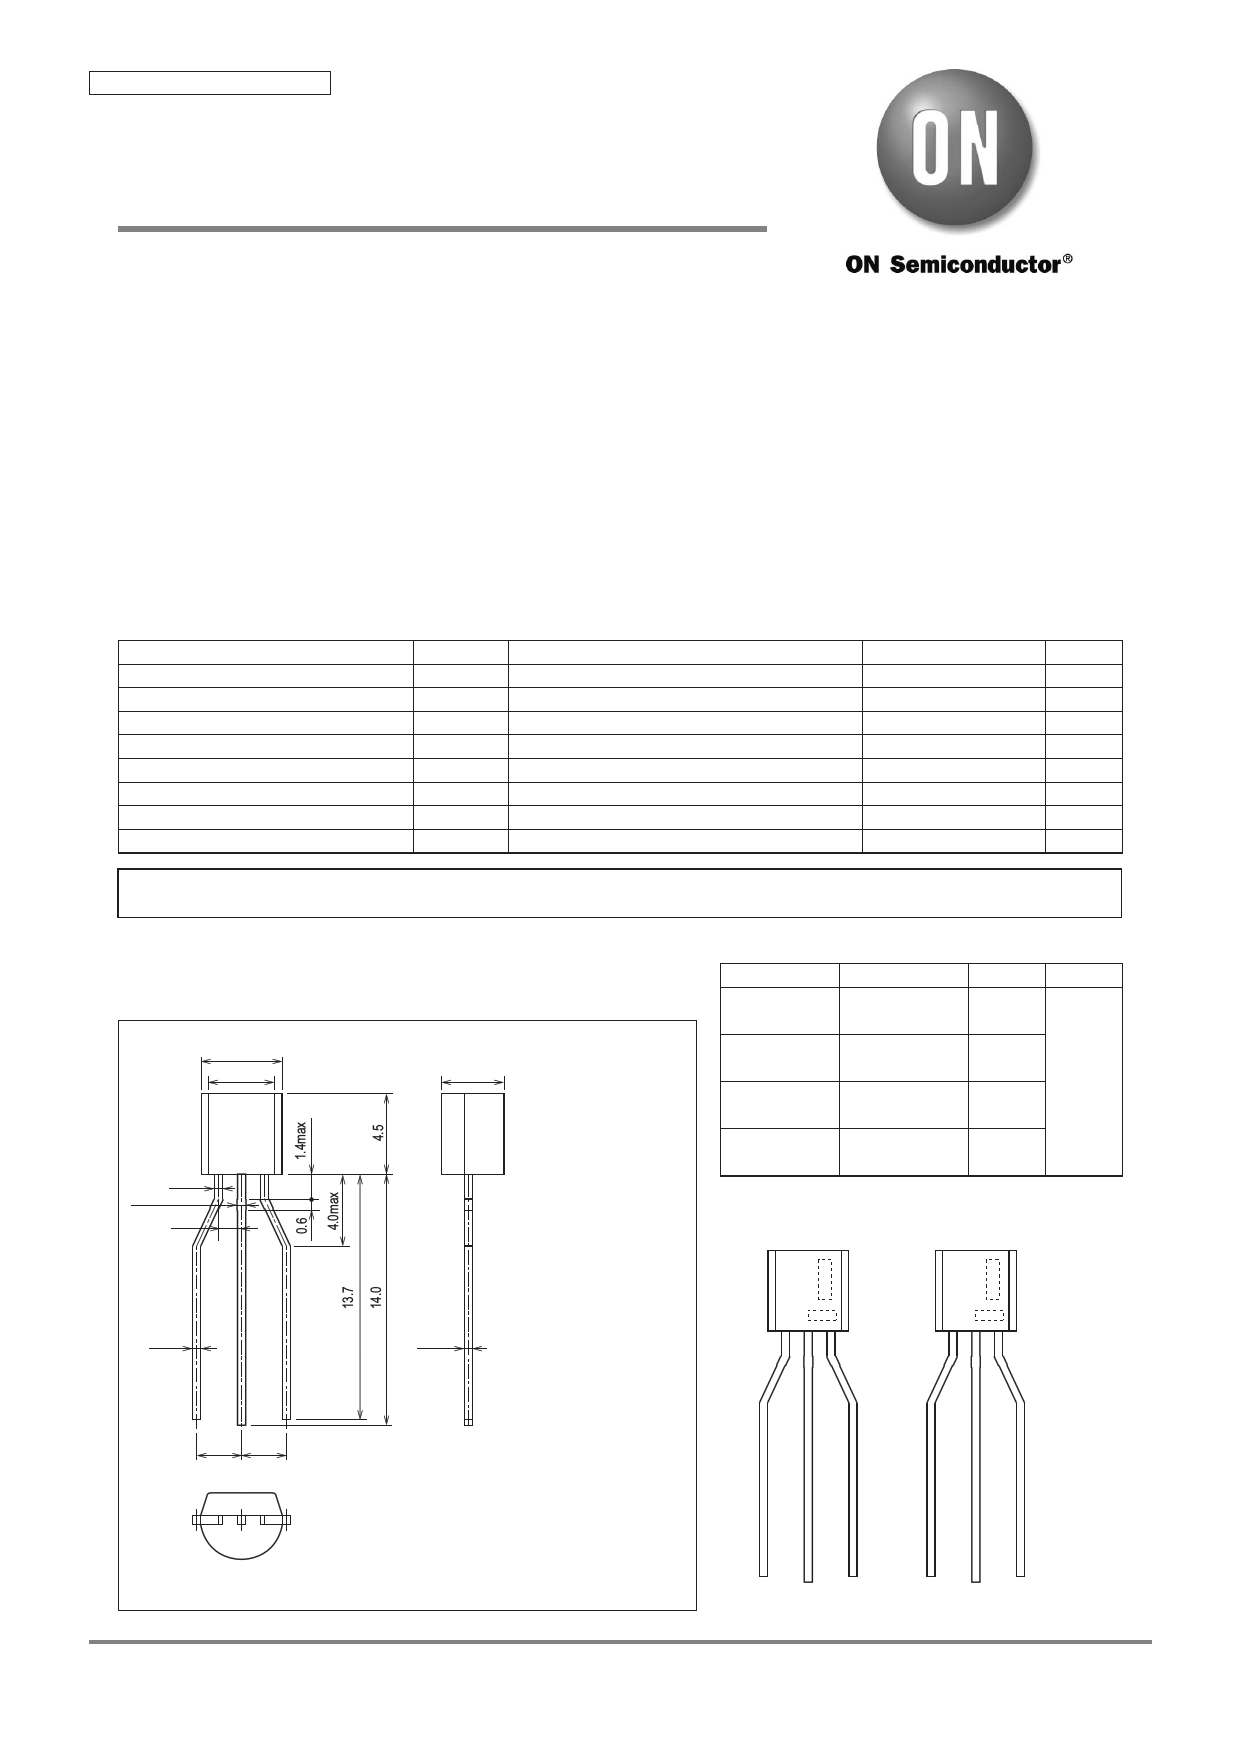 2SC536N Datasheet, 2SC536N PDF,ピン配置, 機能